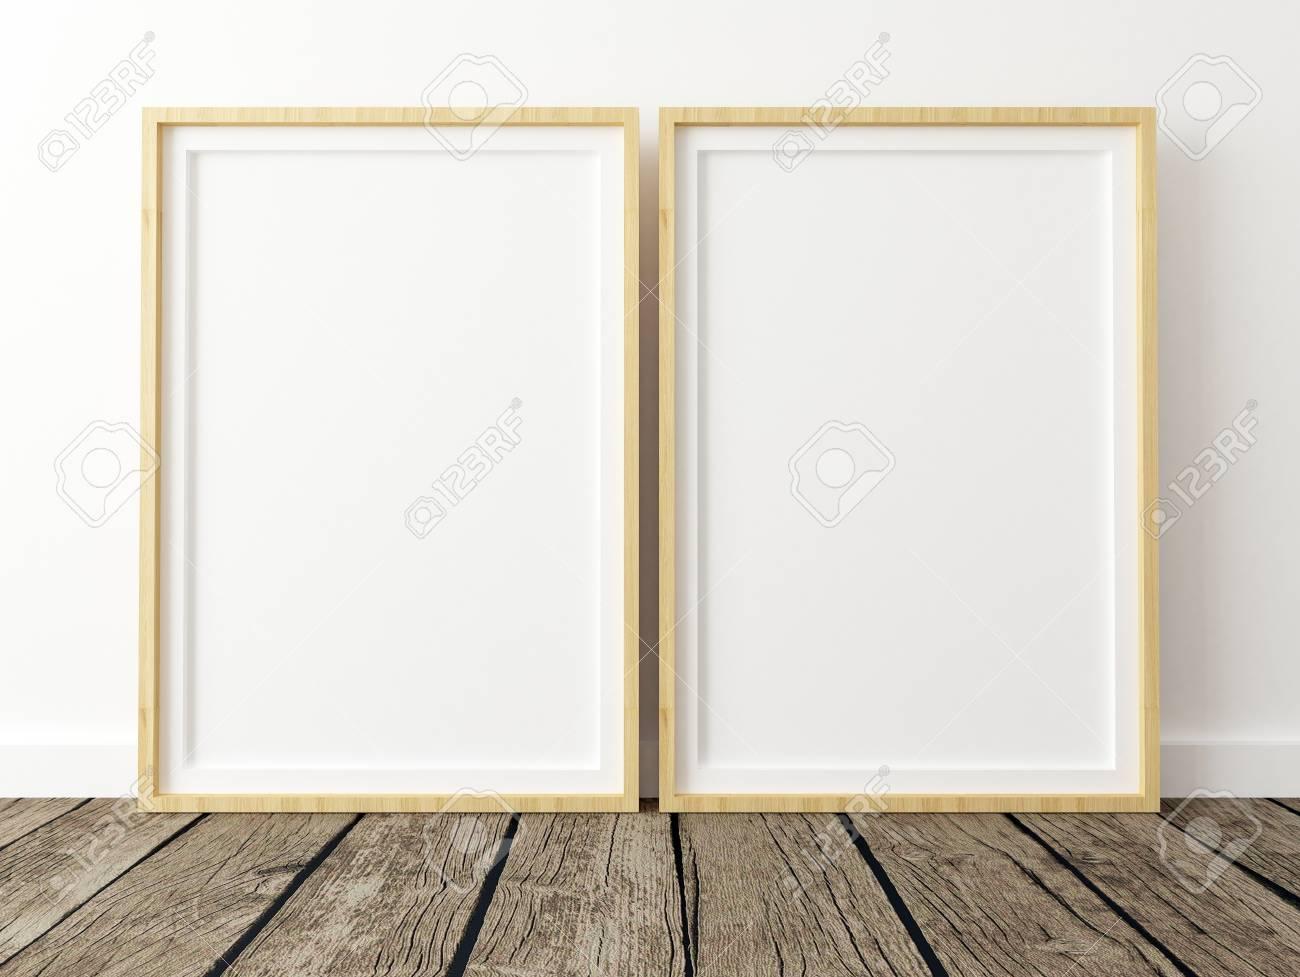 Set of 2 Poster Frame Mockups on White Wall - 77368957